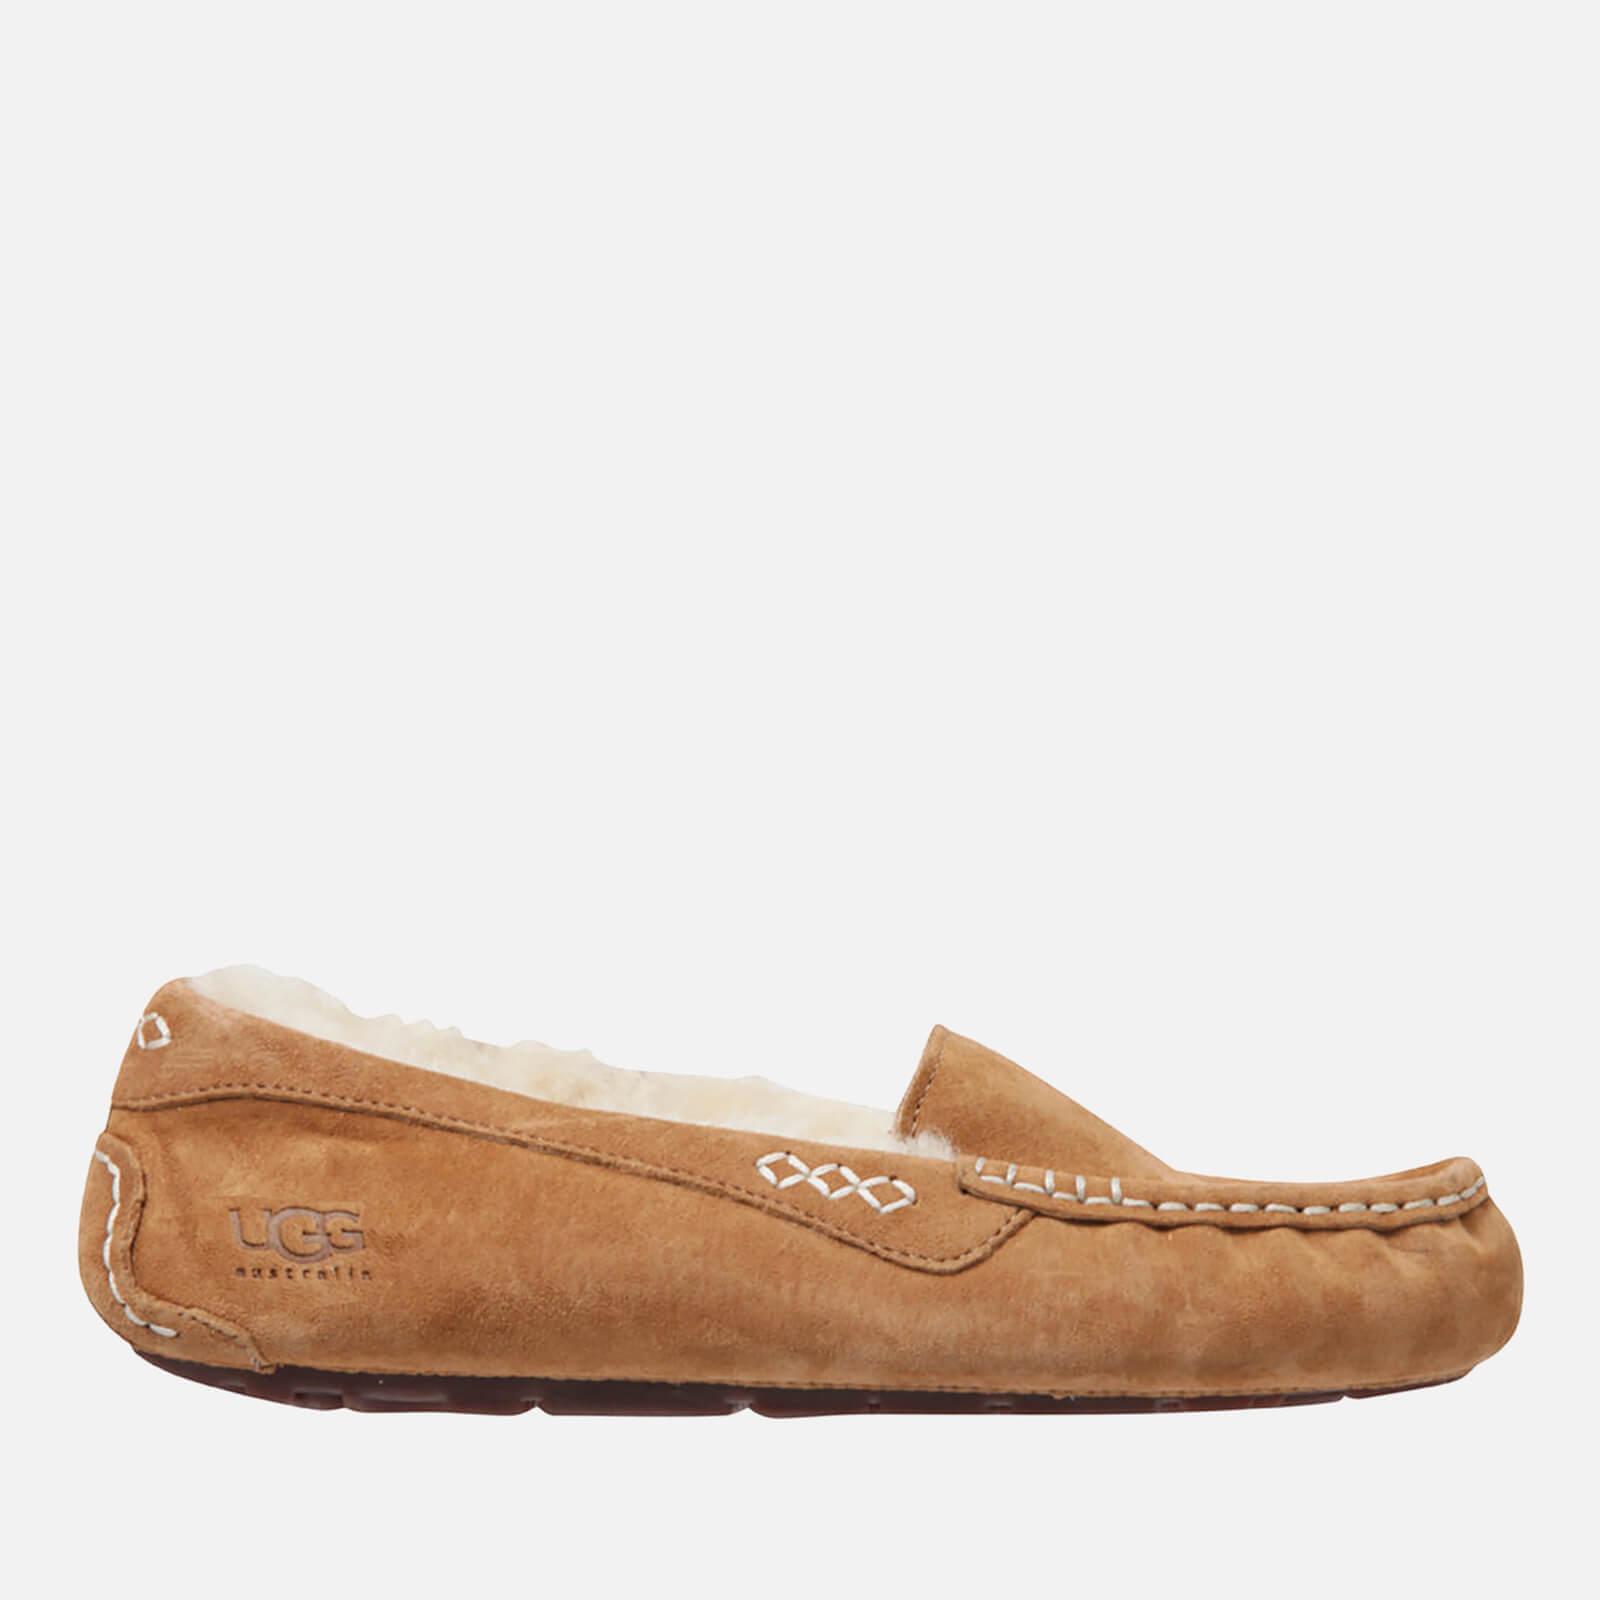 UGG Women's Ansley Moccasin Suede Slippers - Chestnut - UK 5